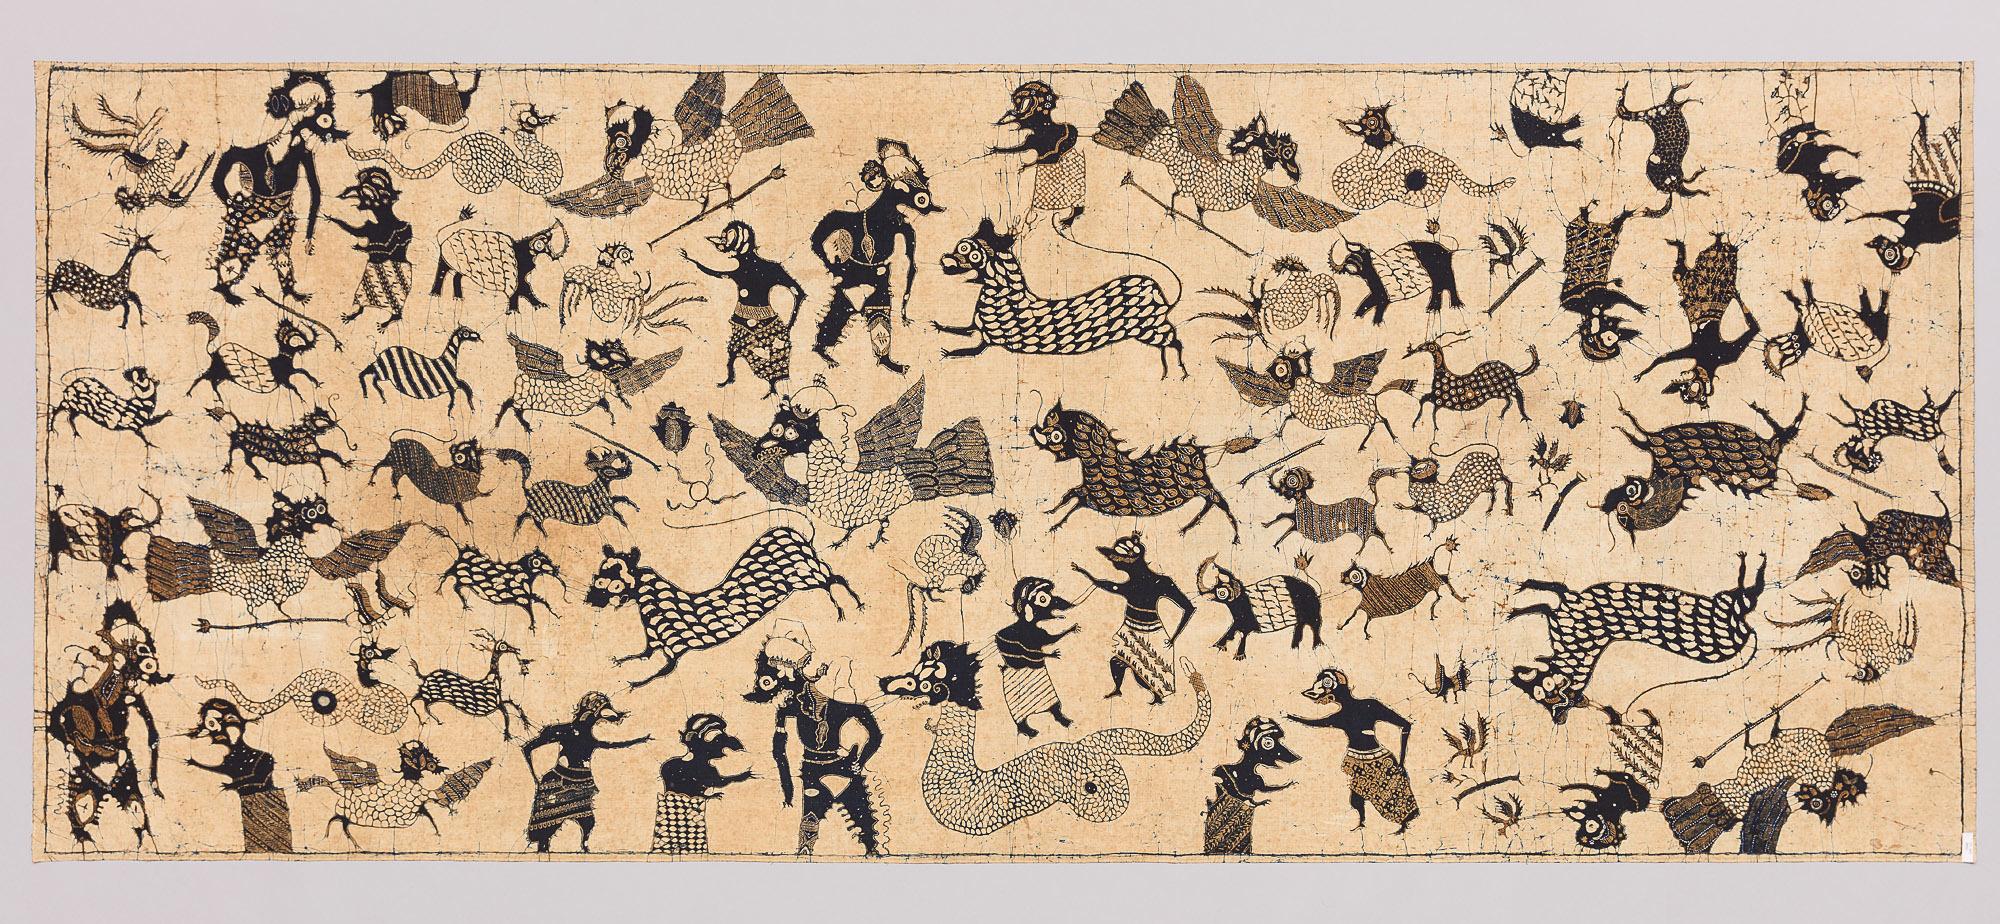 Batik Cloth |  Kain Panjang  | Cirebon, Java | Mid 19th Century © KHM-Museumsverband